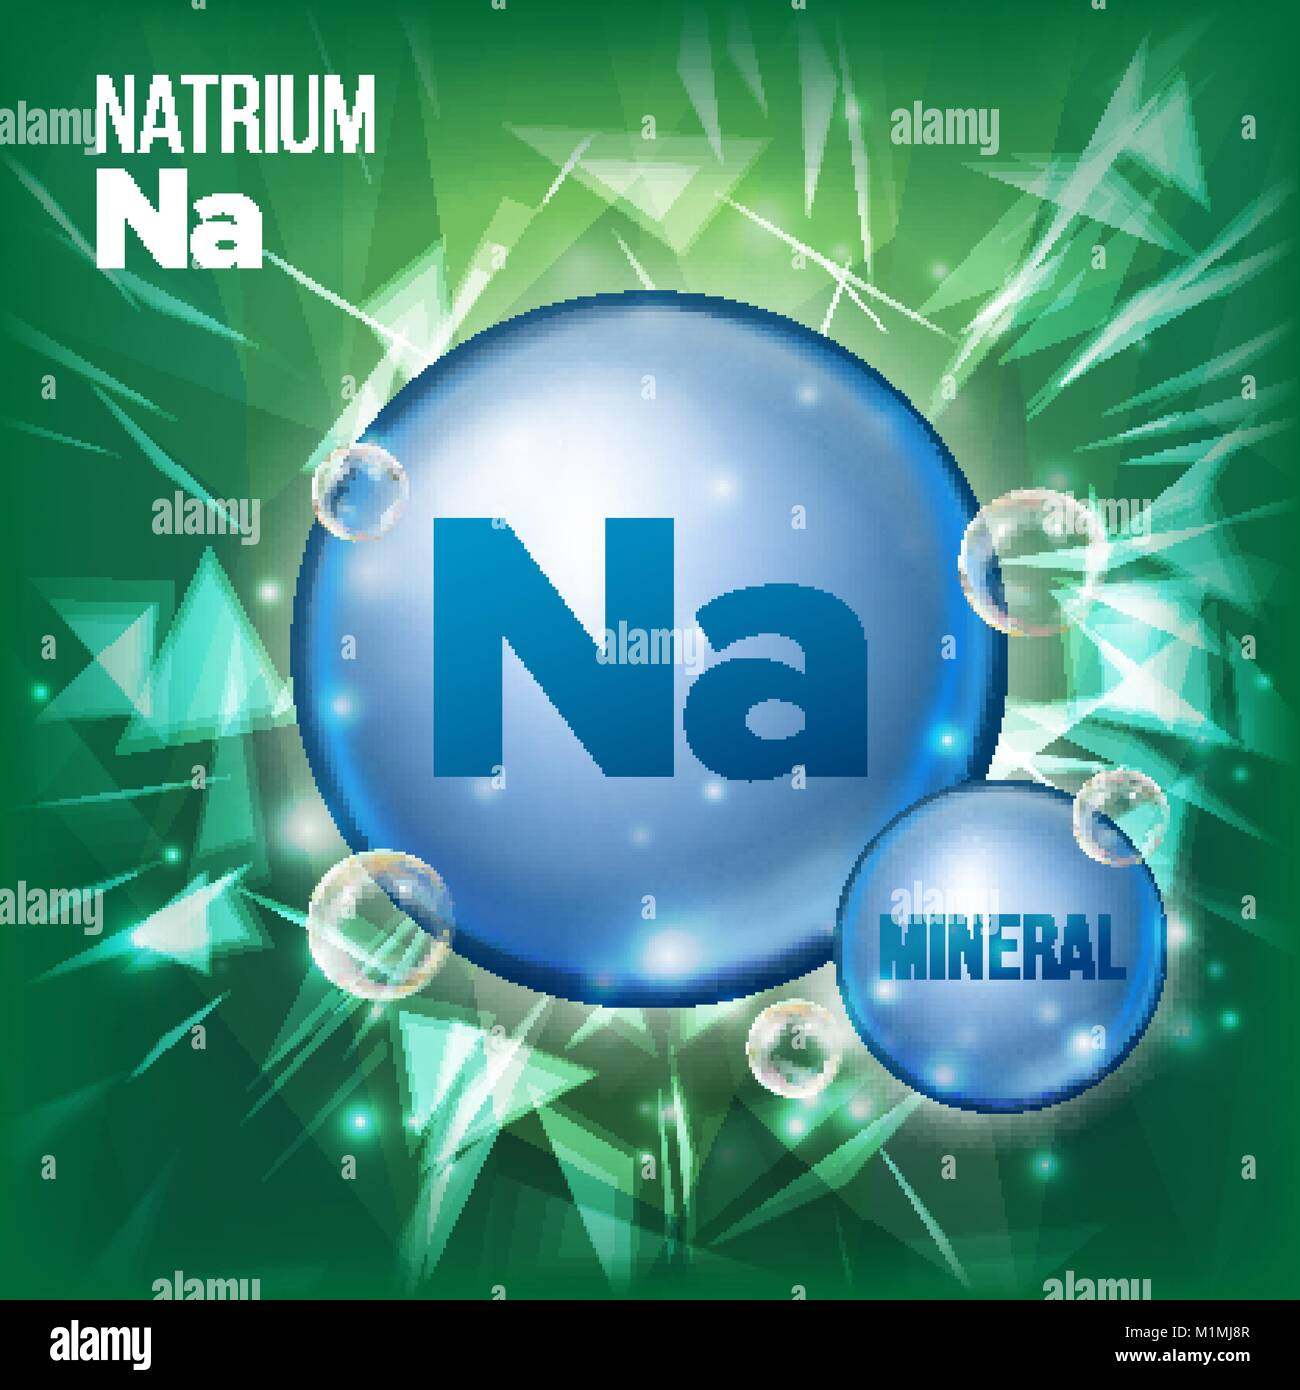 Natrium latino dating